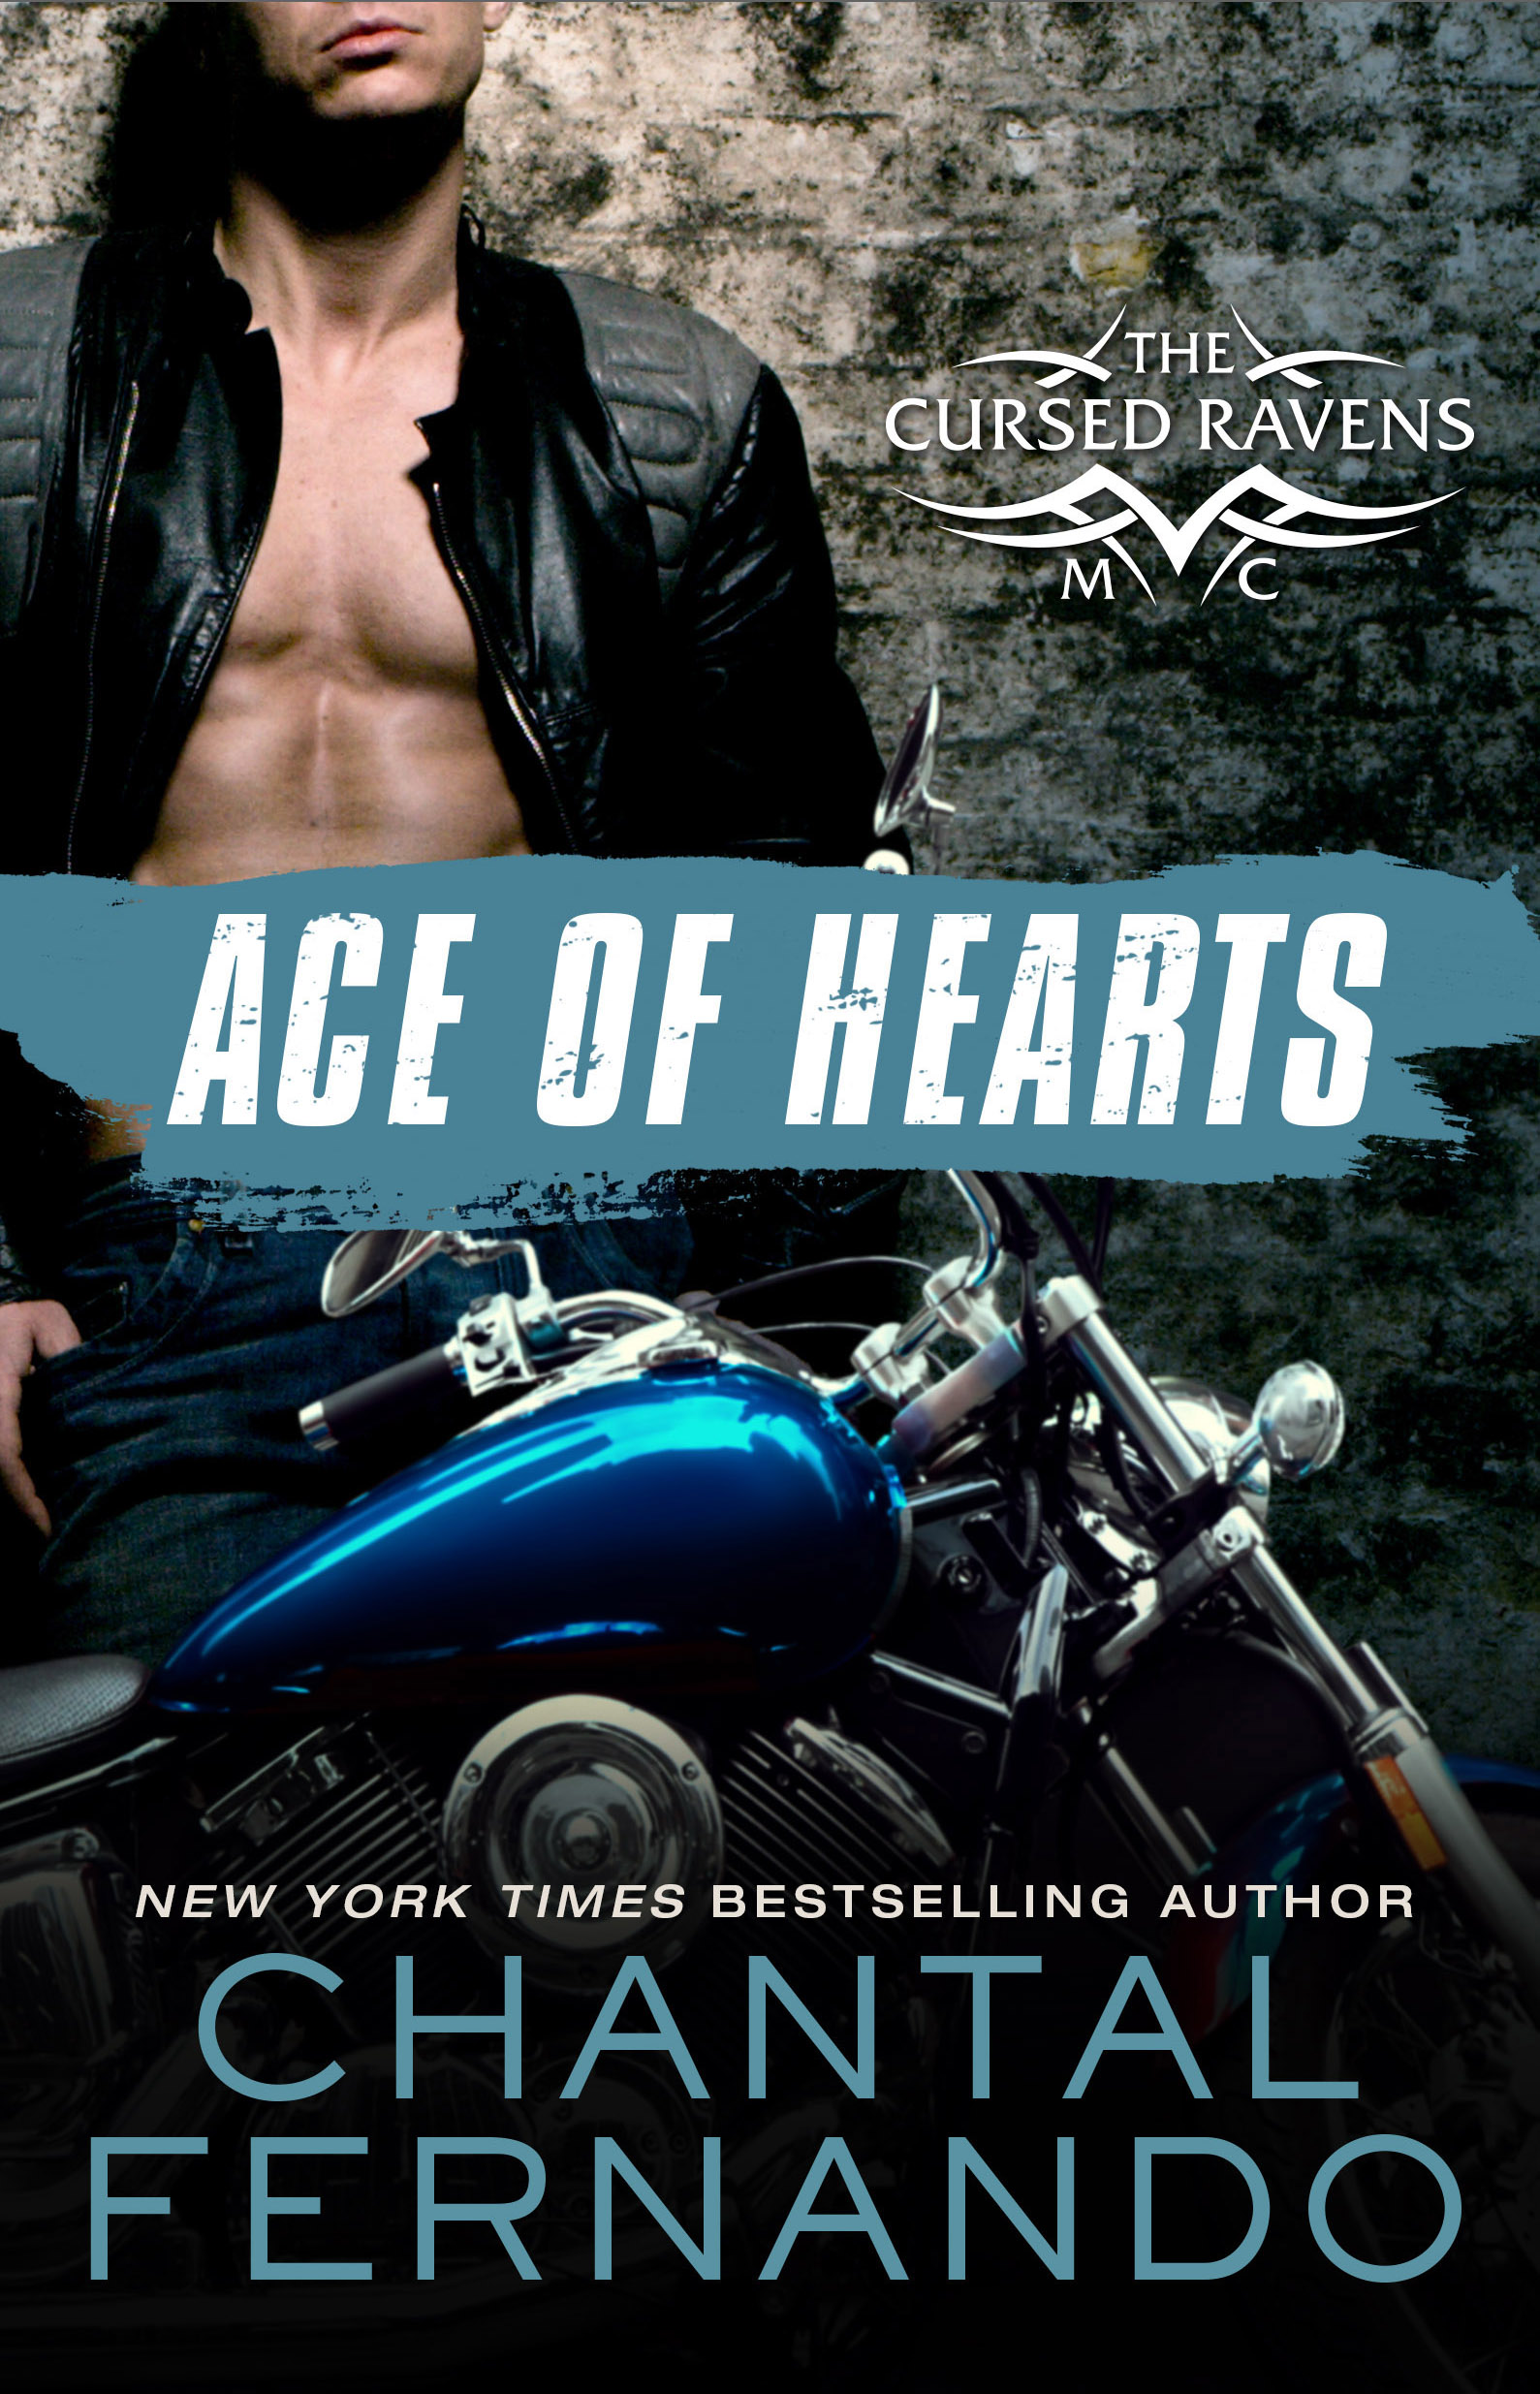 ACE OF HEARTS Cover – Chantal Fernando